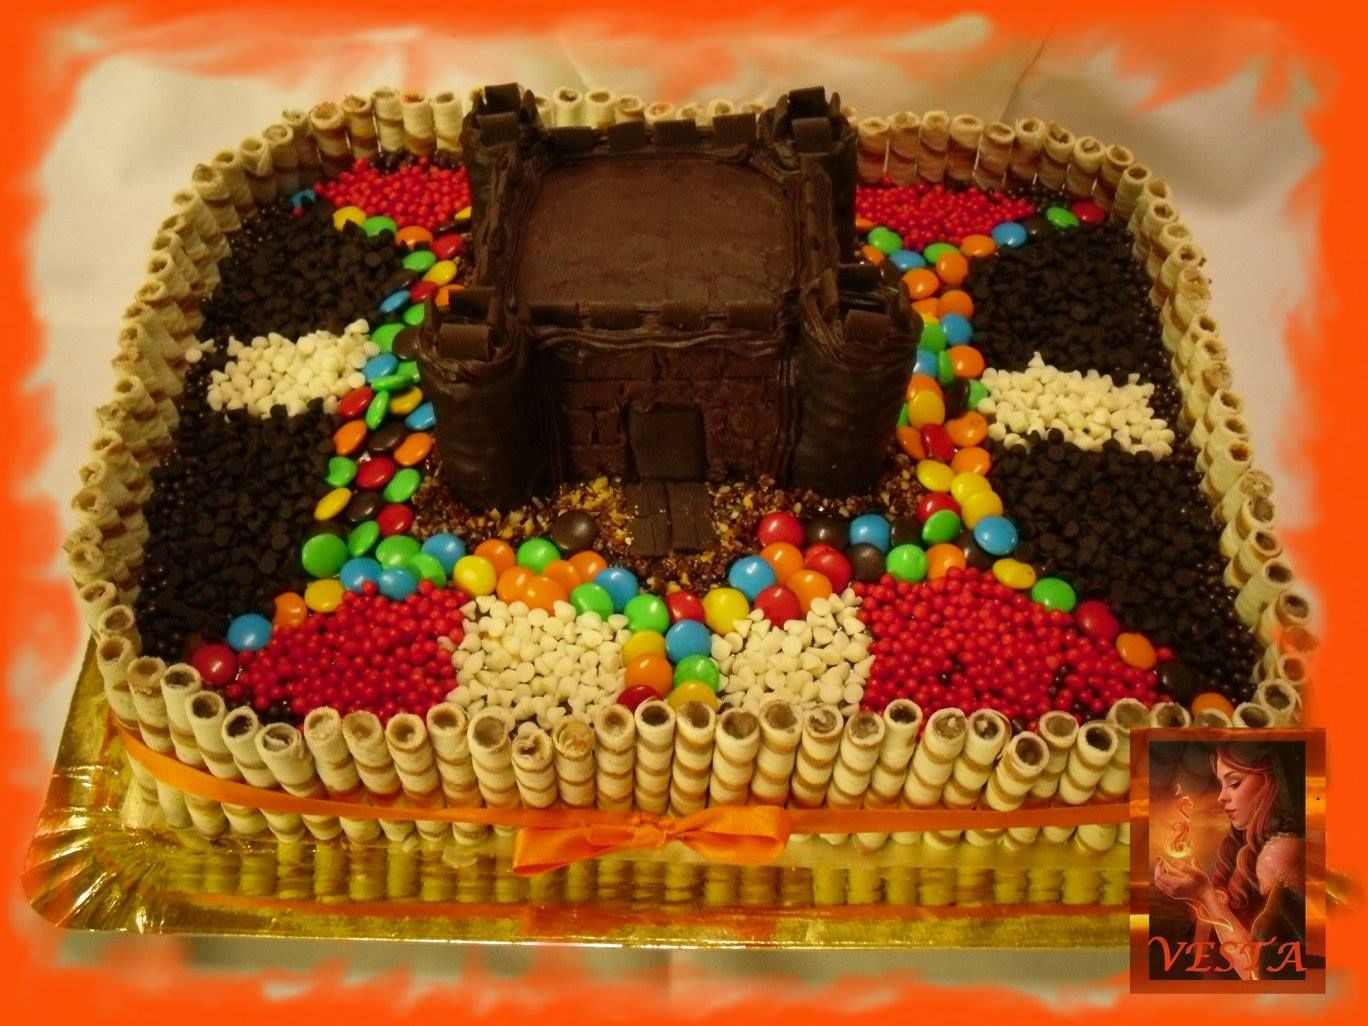 torta golosinera castillo torta decorada con golosinas candy